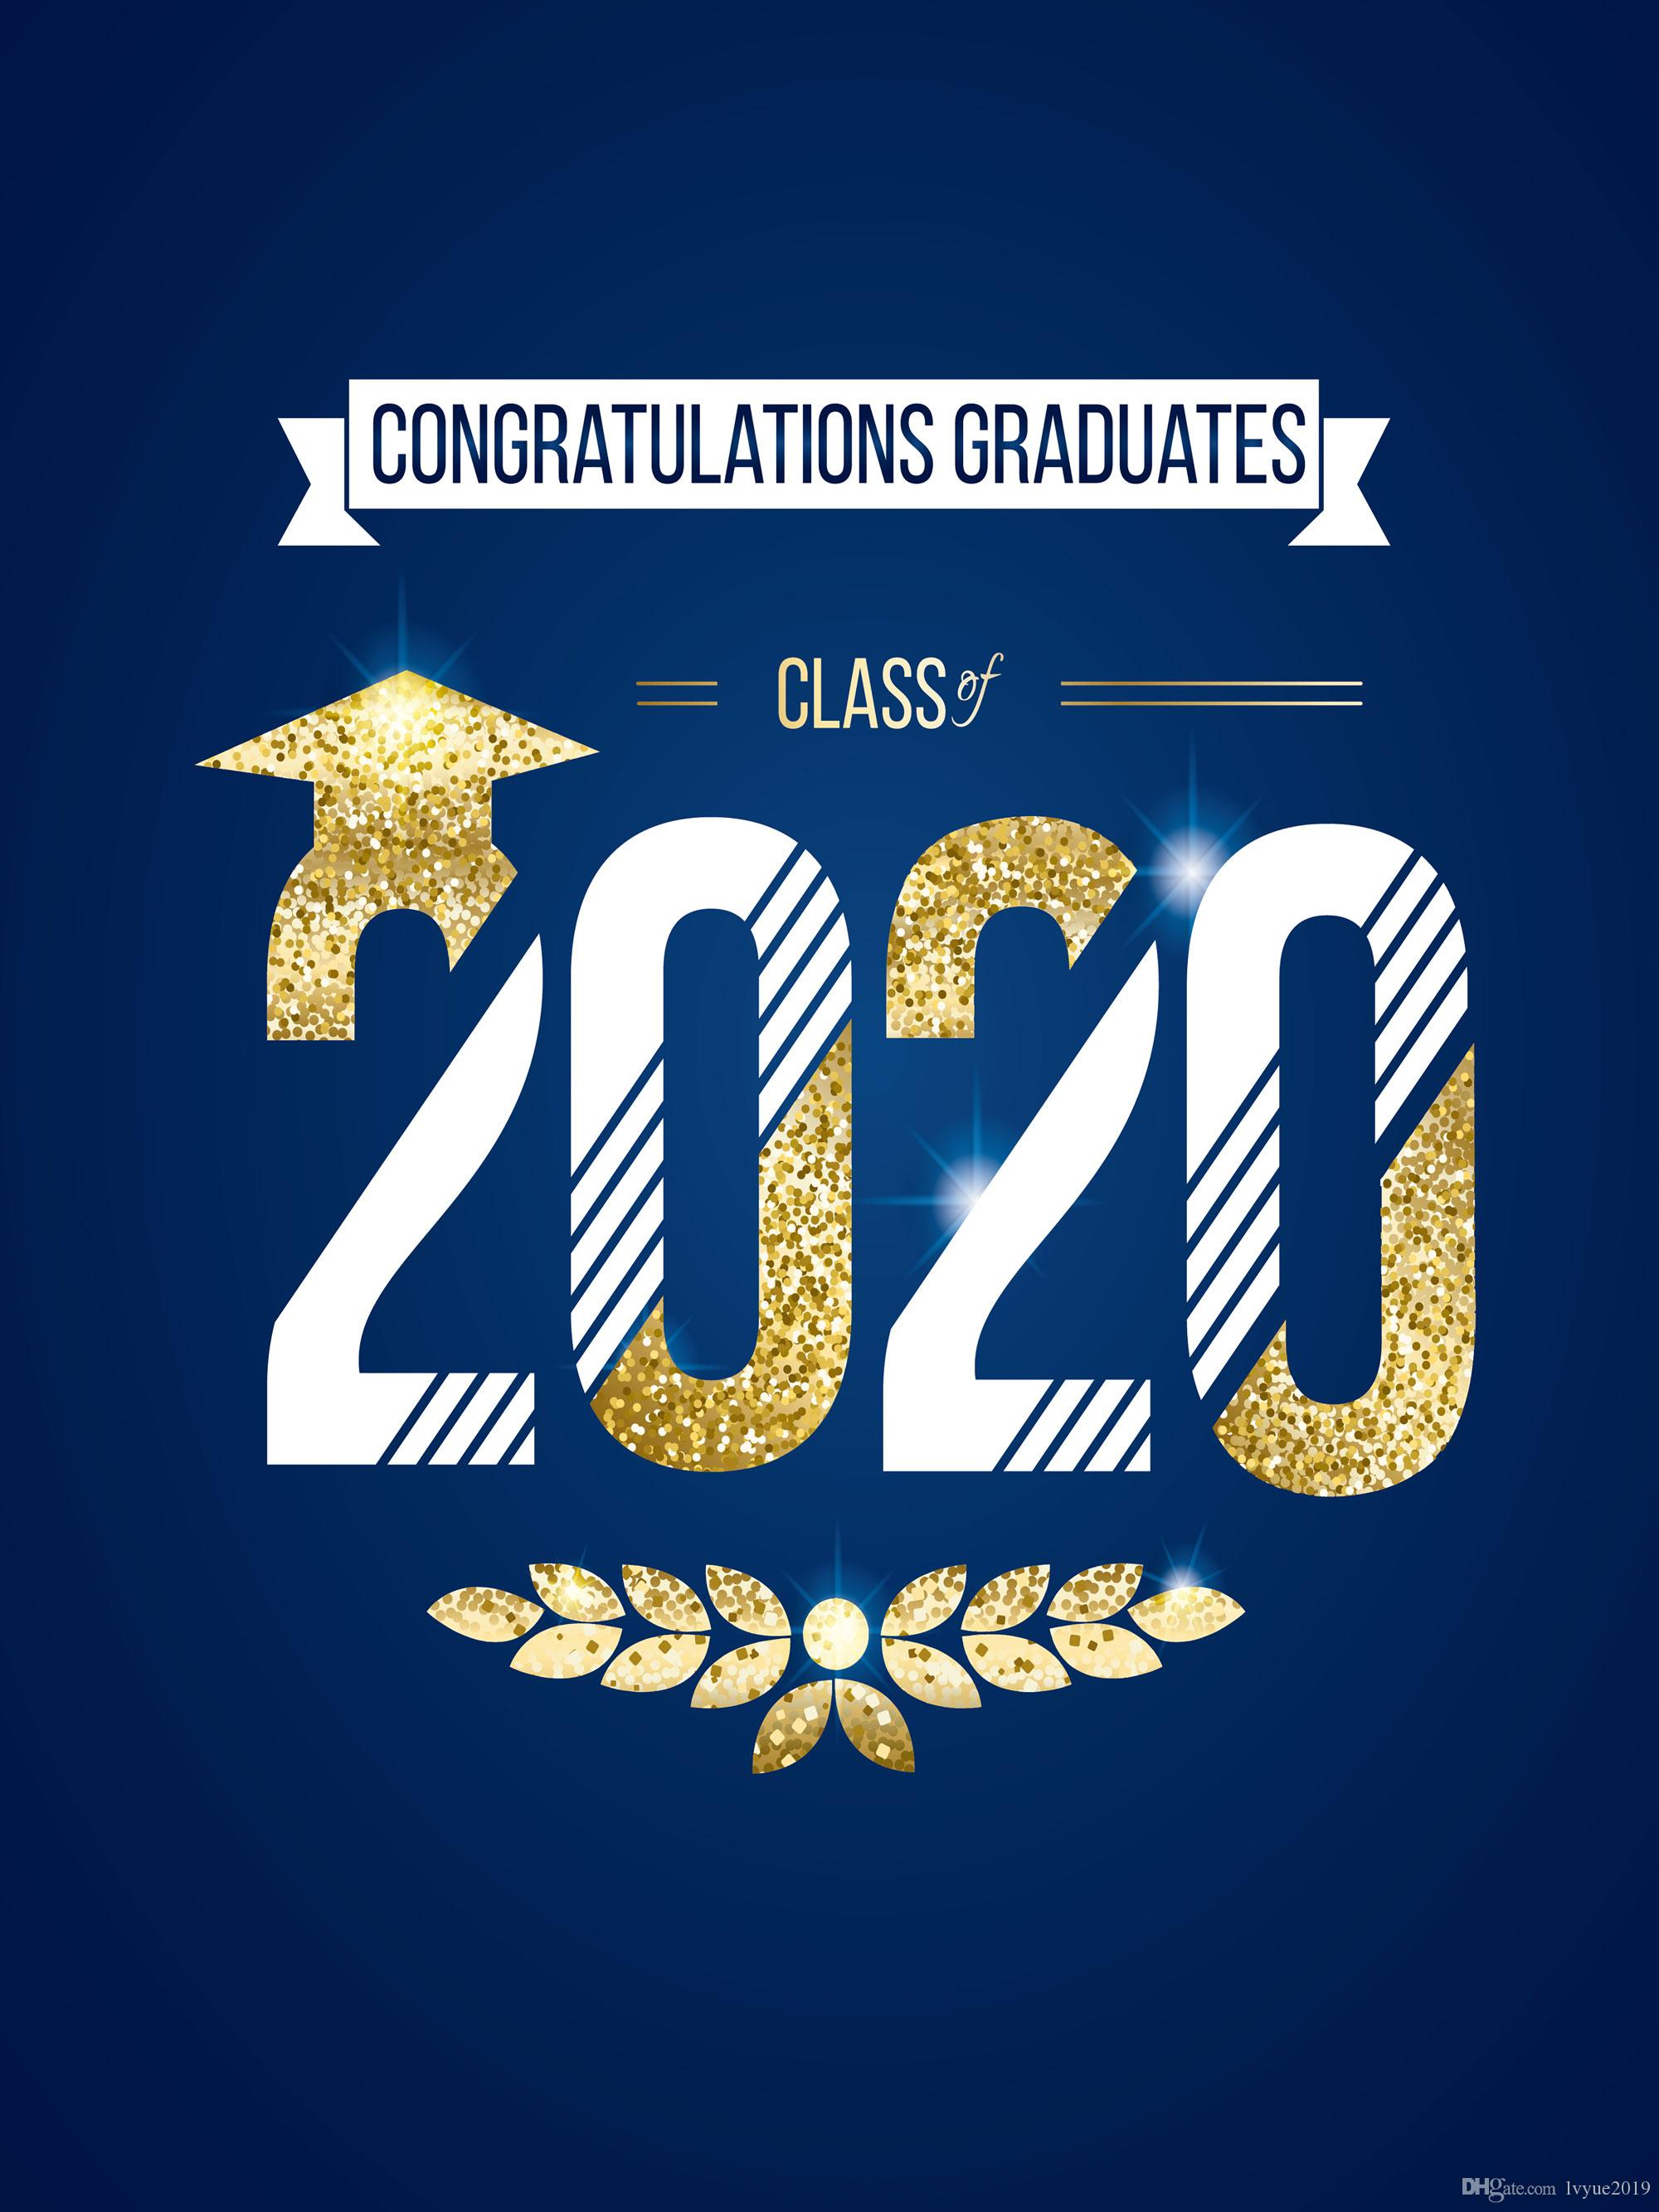 Dudaacvt 7x5ft Vinyl Graduation Party Backdrop for Photography Class of 2020 Congrats Grad and Graduation Cap Design Photo Booth Backdrop Customized Photo Backgrounds Studio Props D171